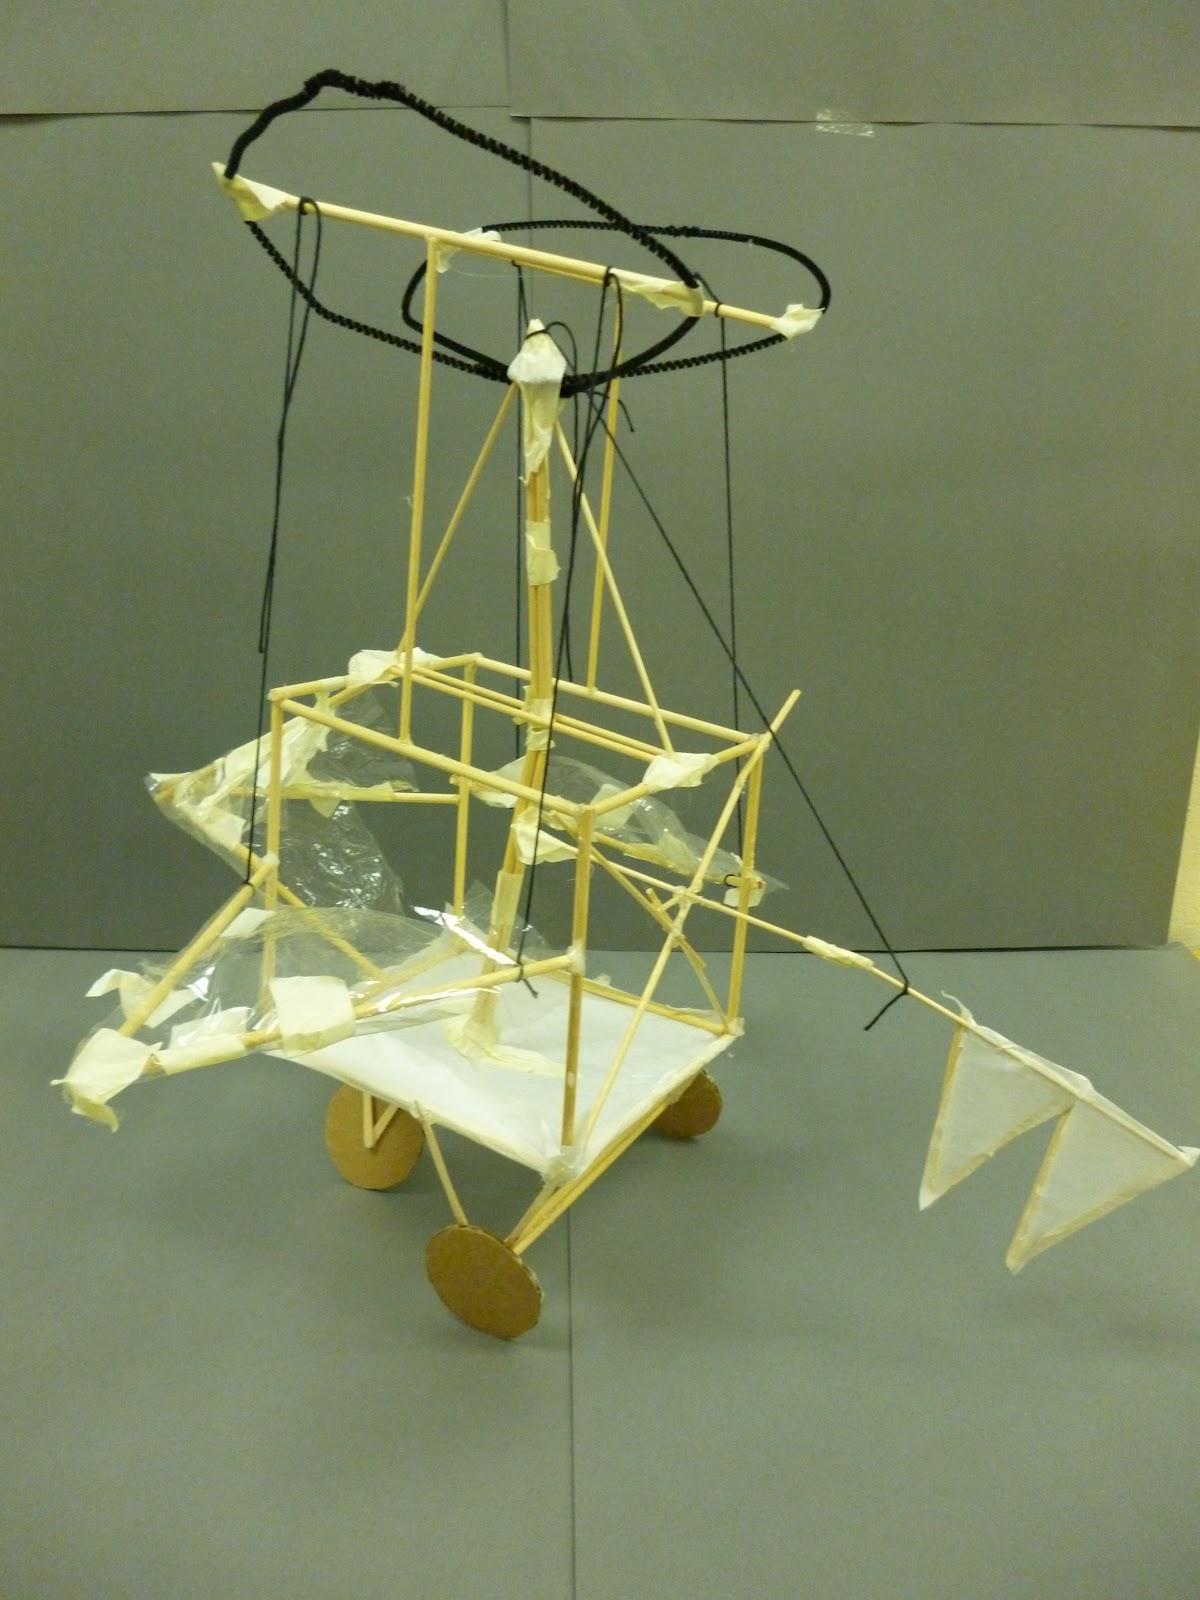 Leonardo Da Vinci Antique Flying Machine Digital Art by ... |Leonardo Da Vinci Flying Machine